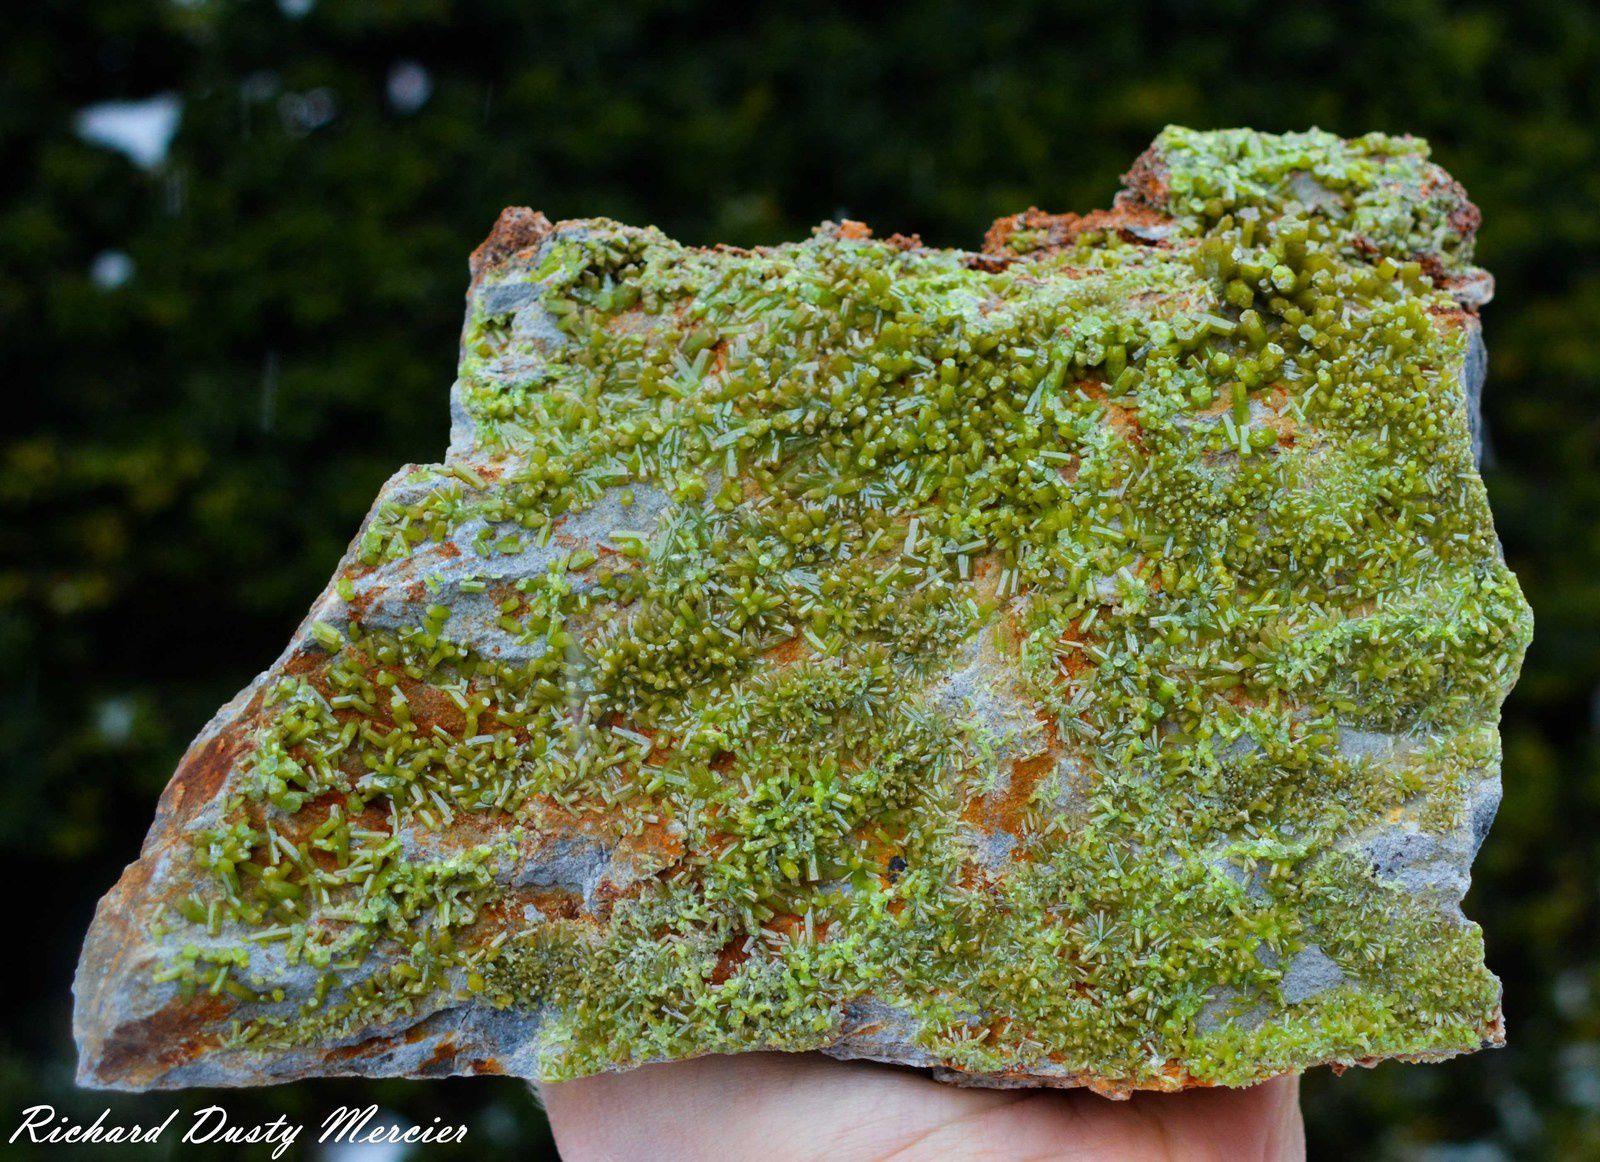 Pyromorphyte from China (Specimen and Photo: Richard Dusty Mercier)